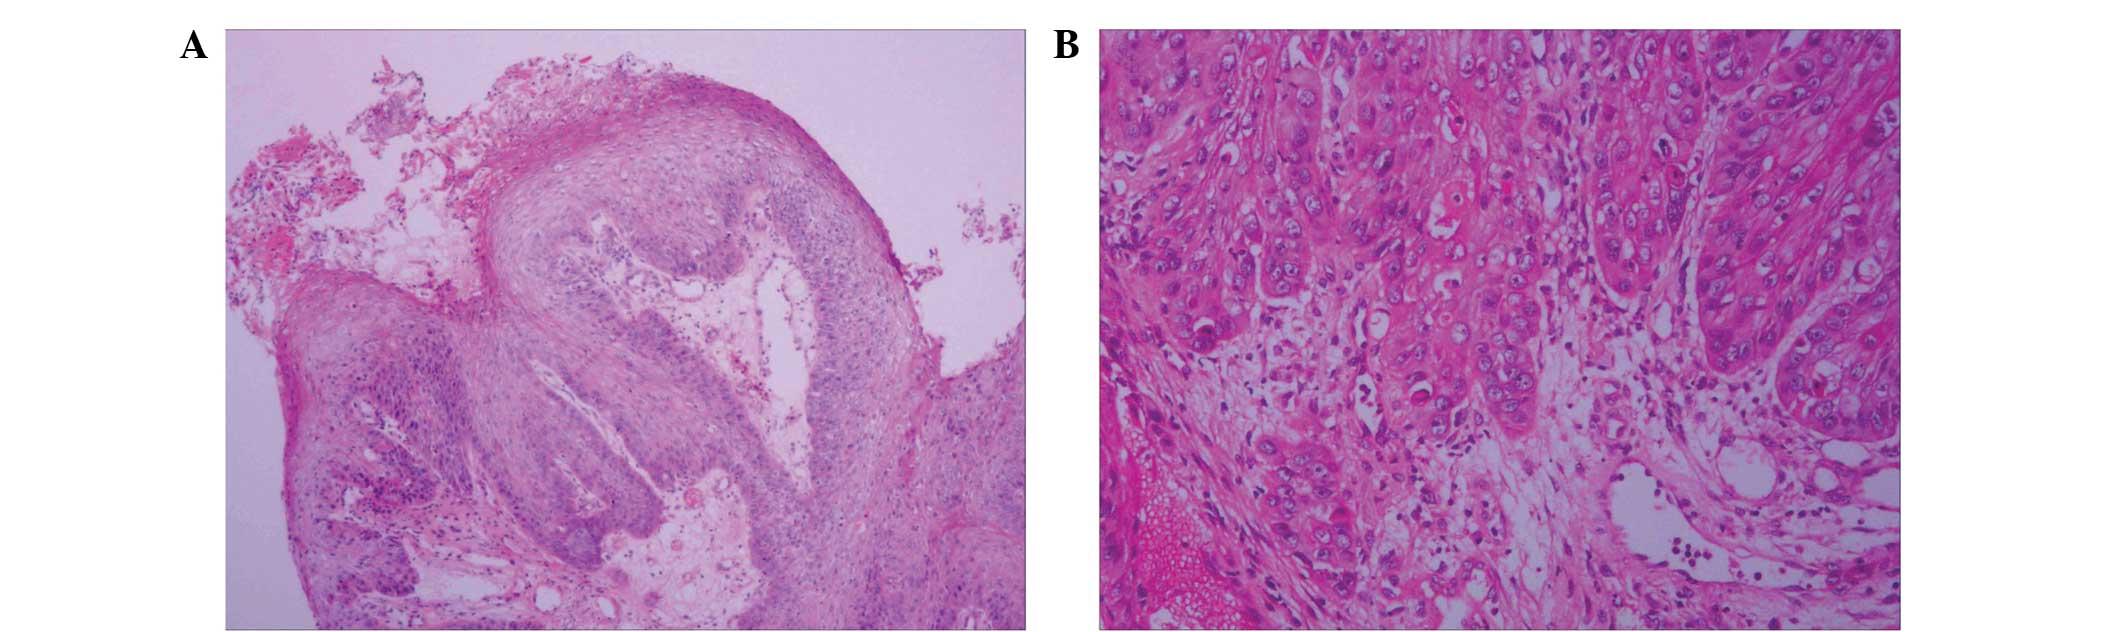 respiratory papillomatosis symptoms in babies anemie gestationala